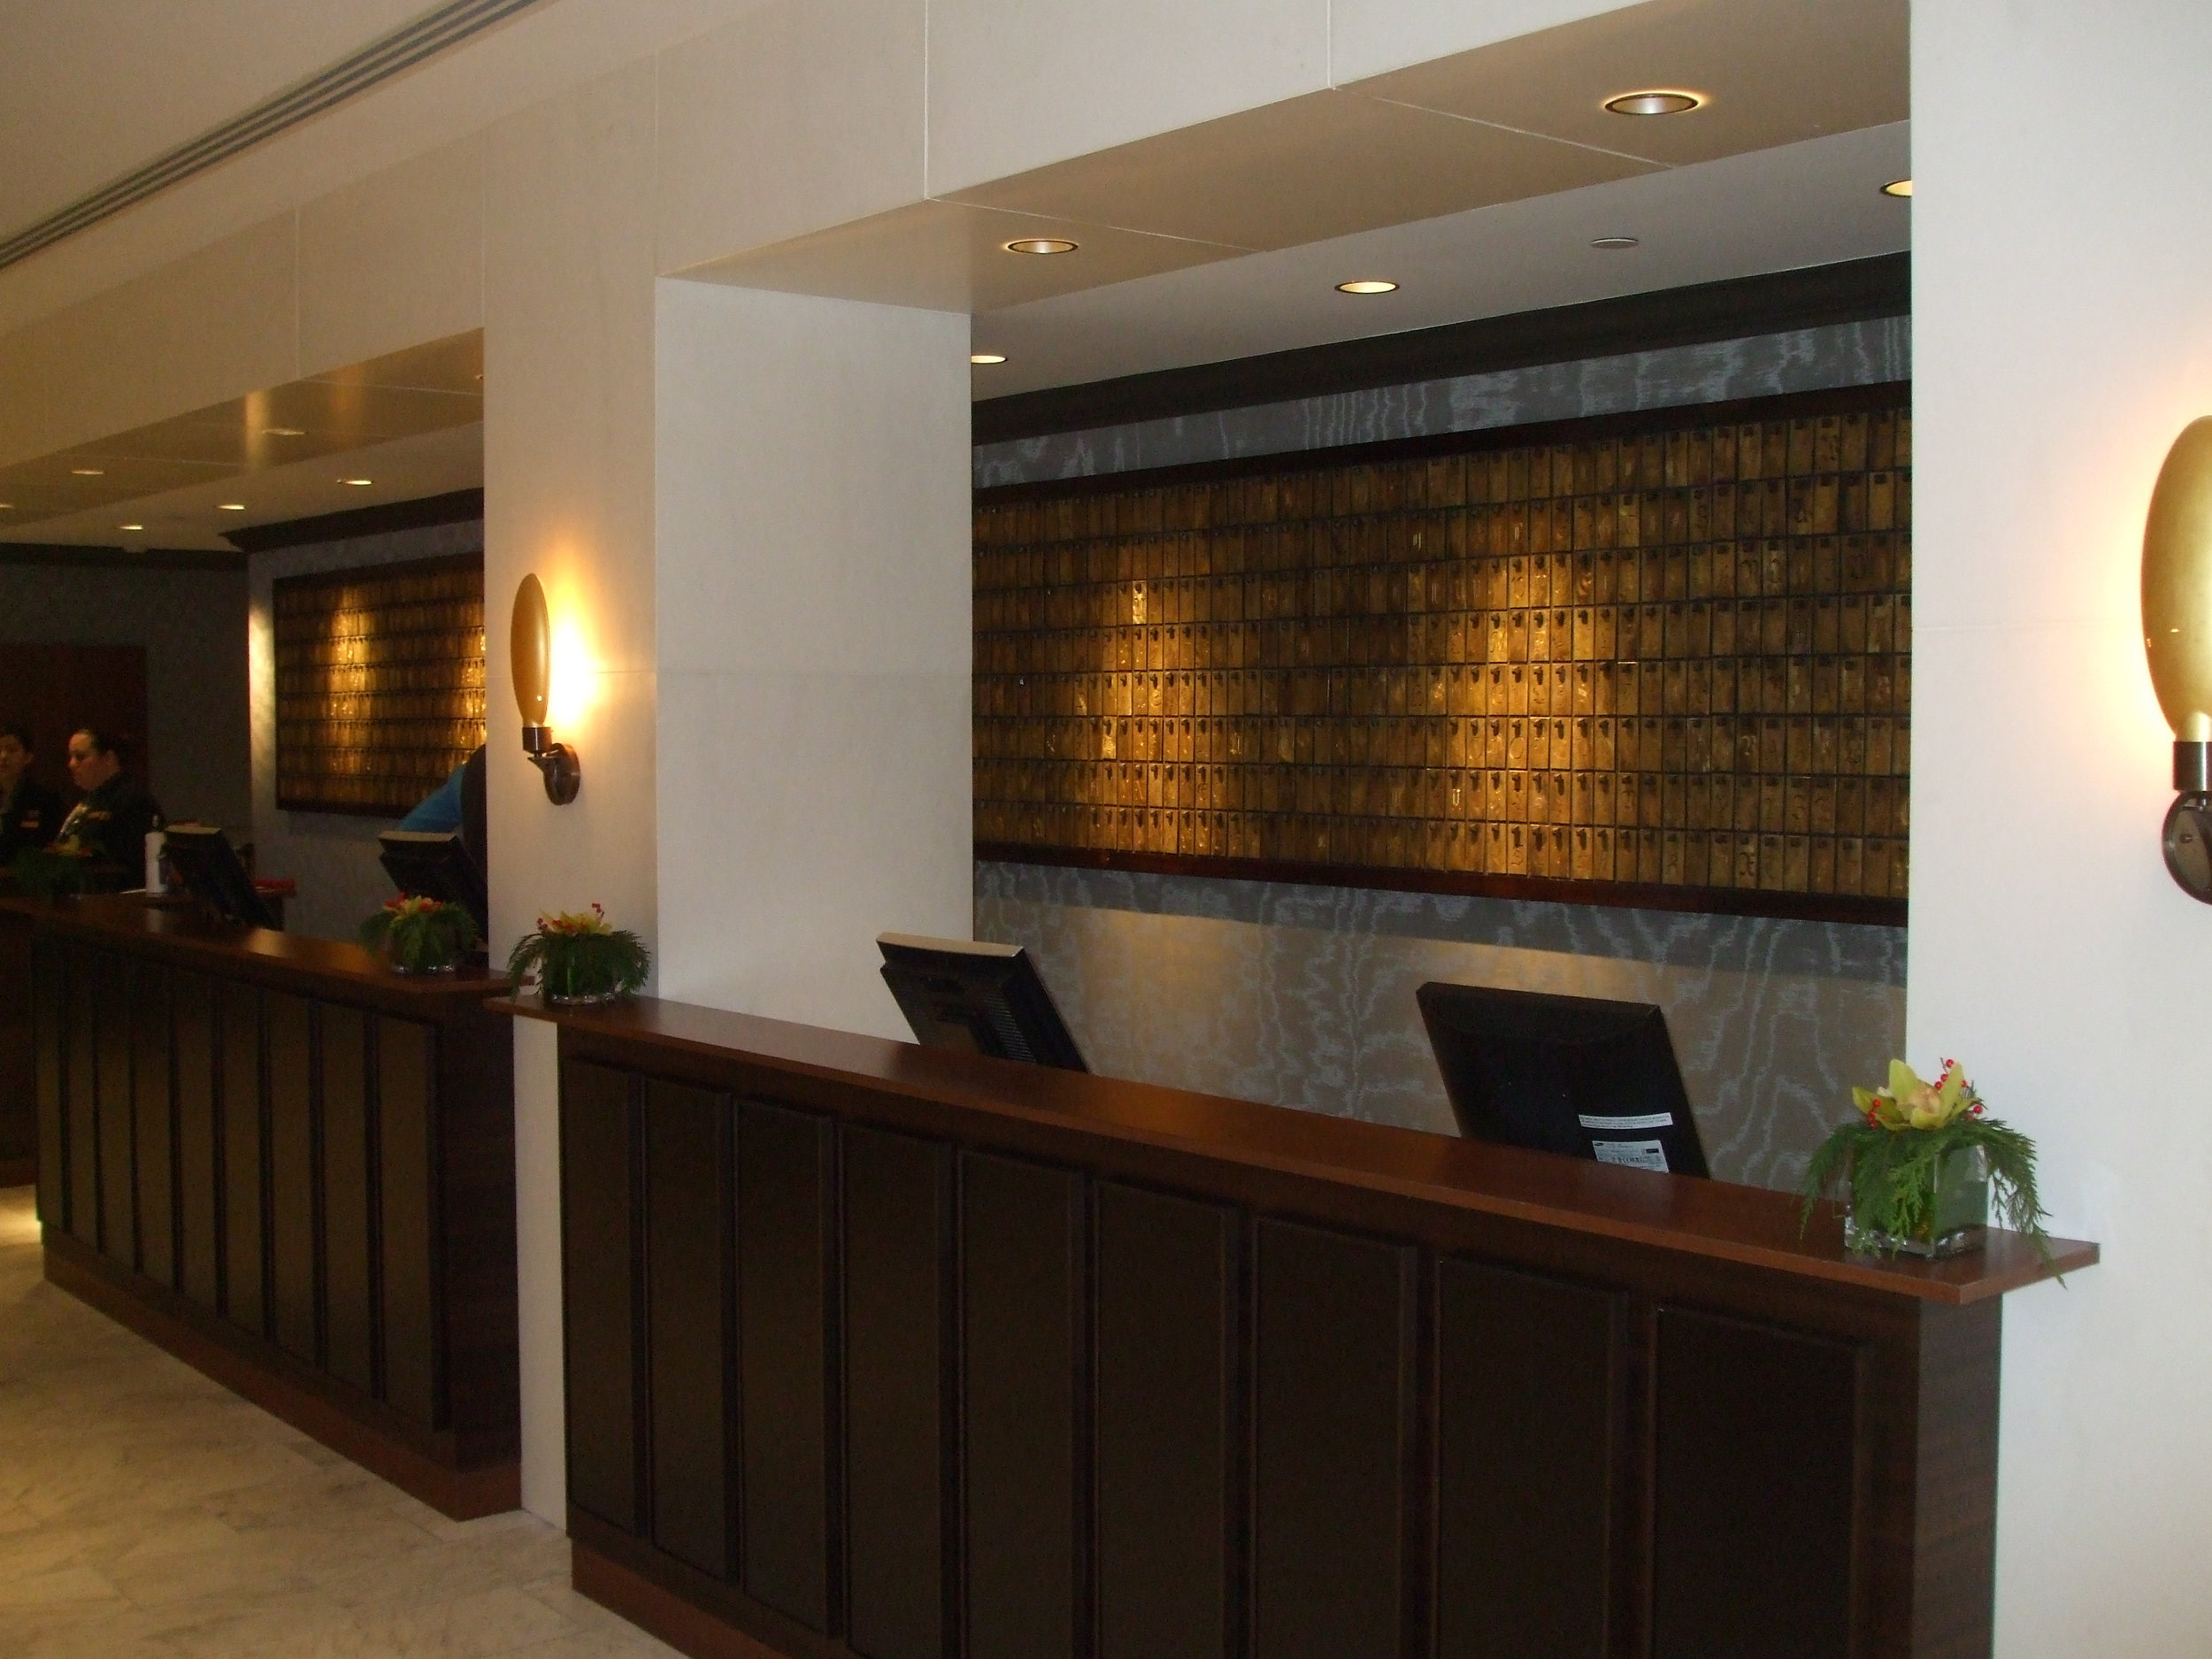 HVC-Lobby-Front Desk-DAC Art Piece-Art 100 copy (deleted 15de220d7294e70e47ad5dfe18610aa4).JPG